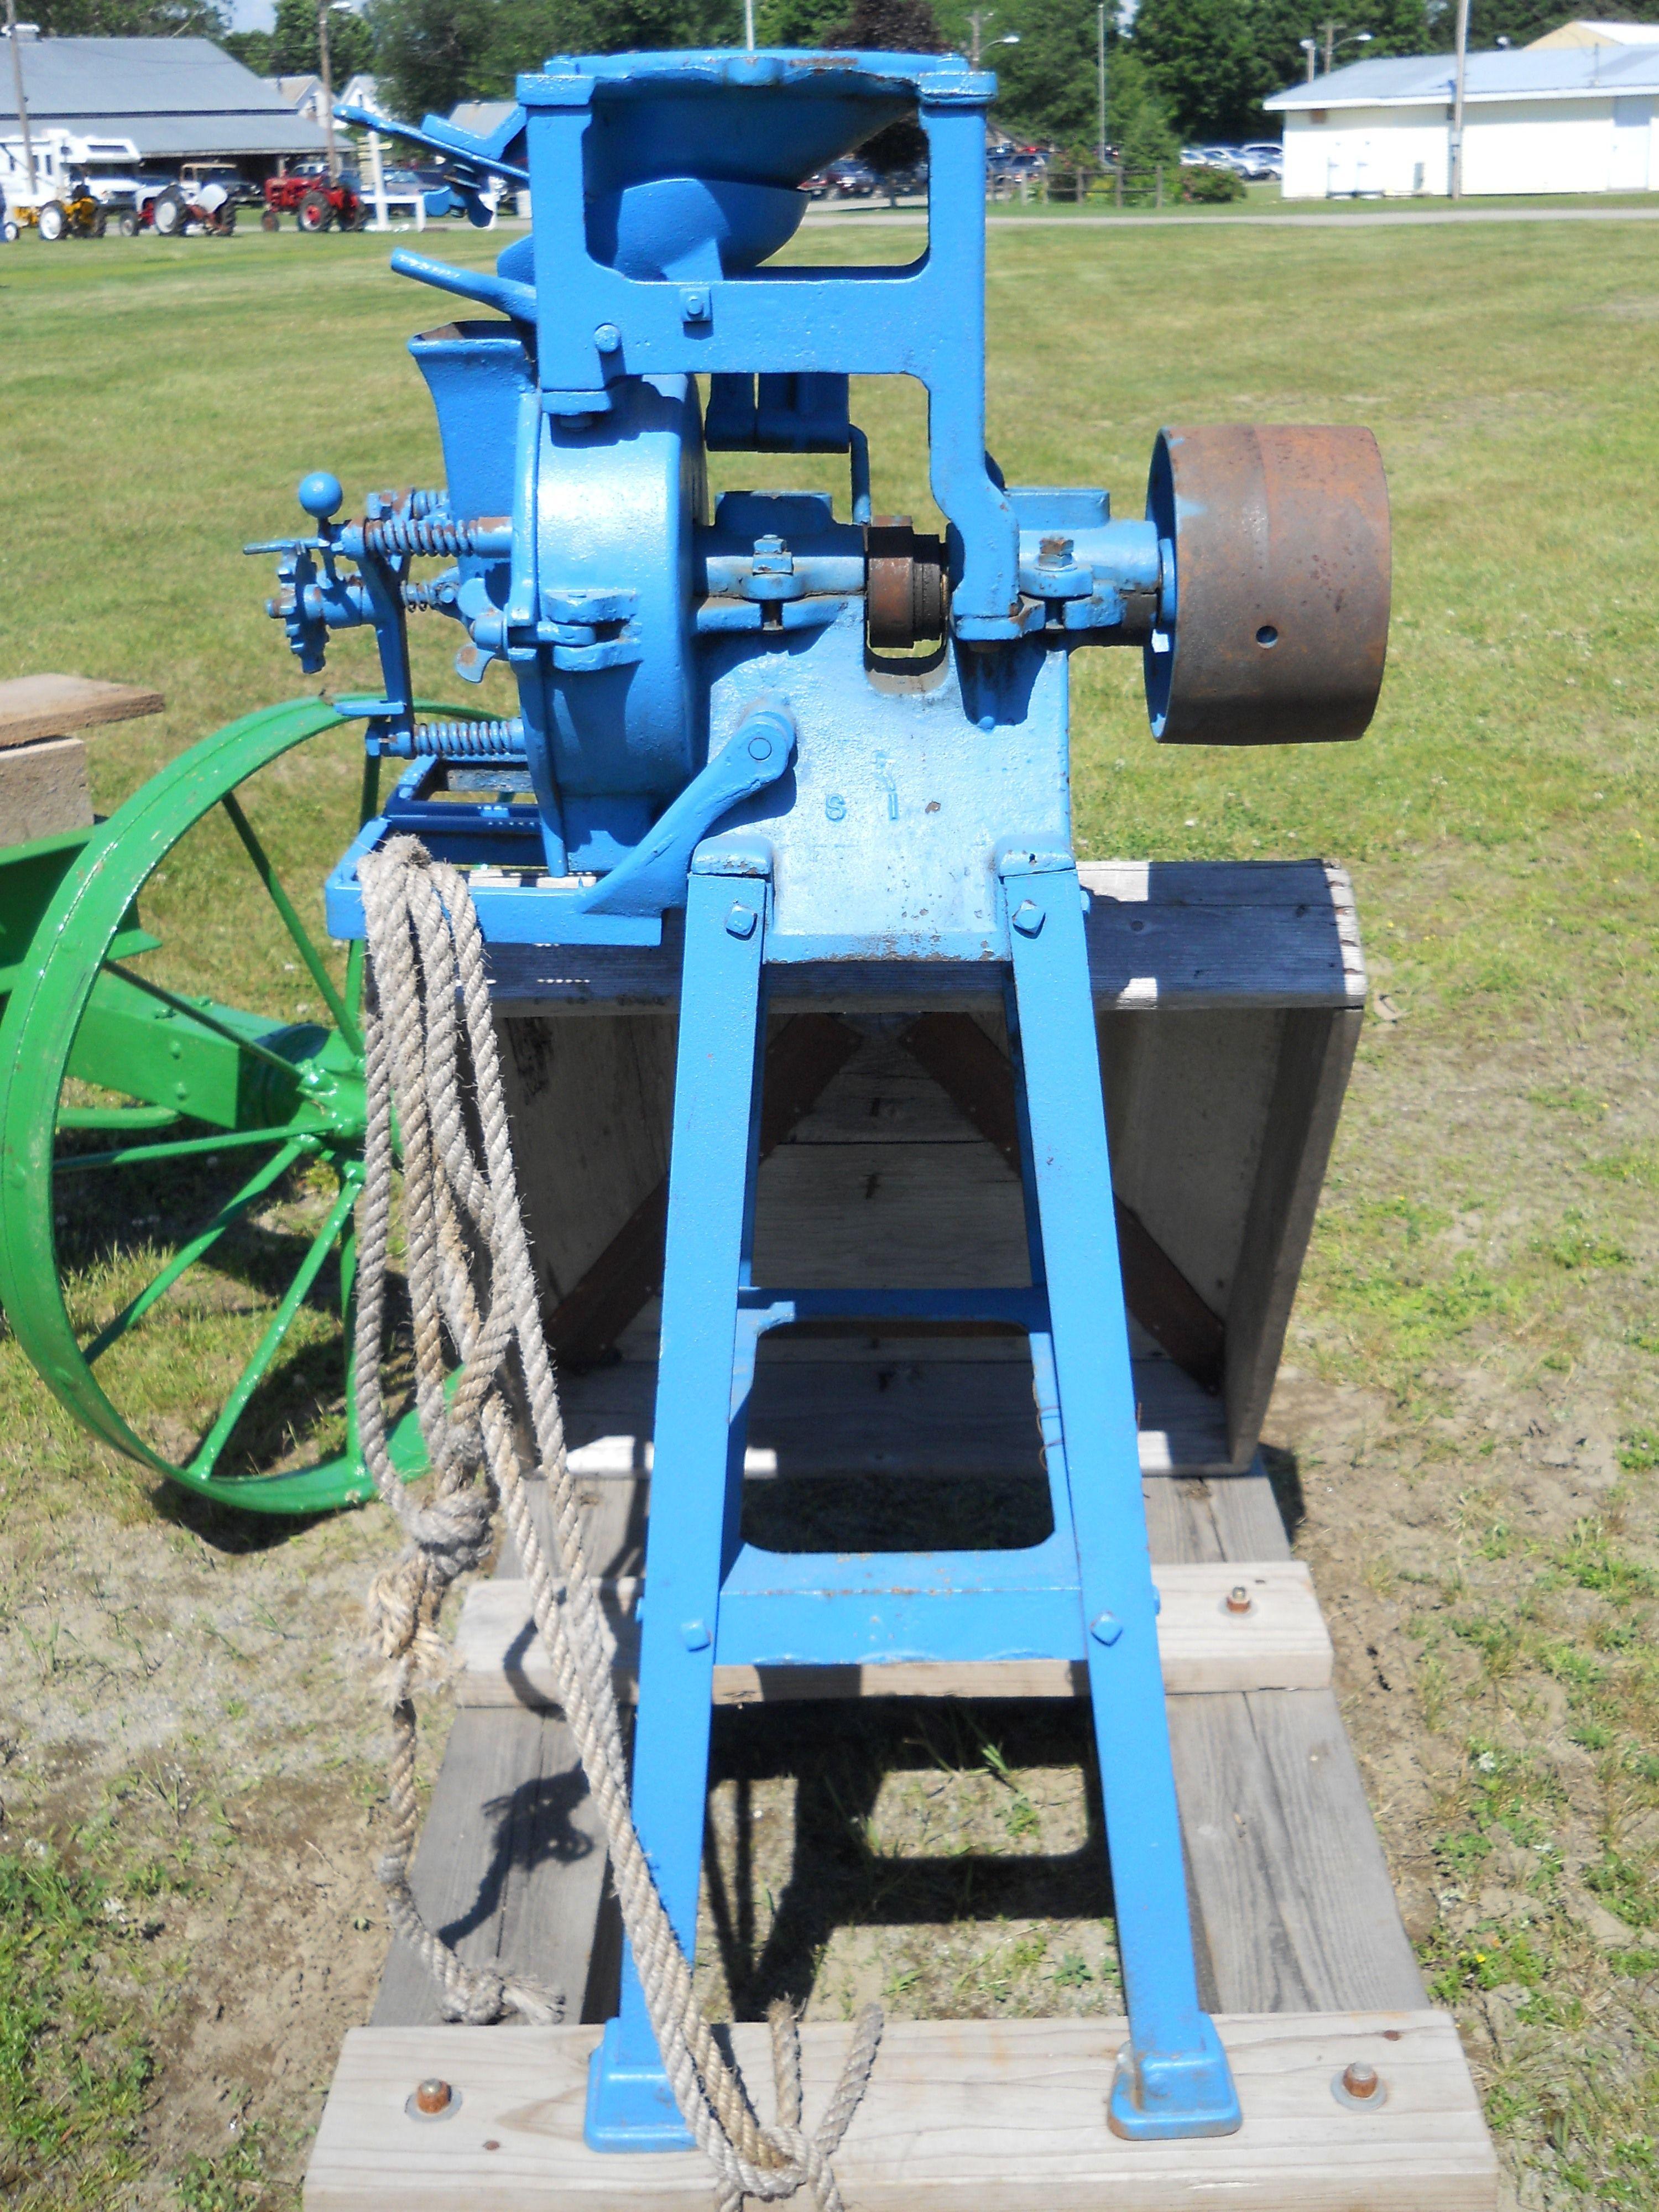 Farm Machinery Belts : Olden day belt driven equipment farm machinery pinterest